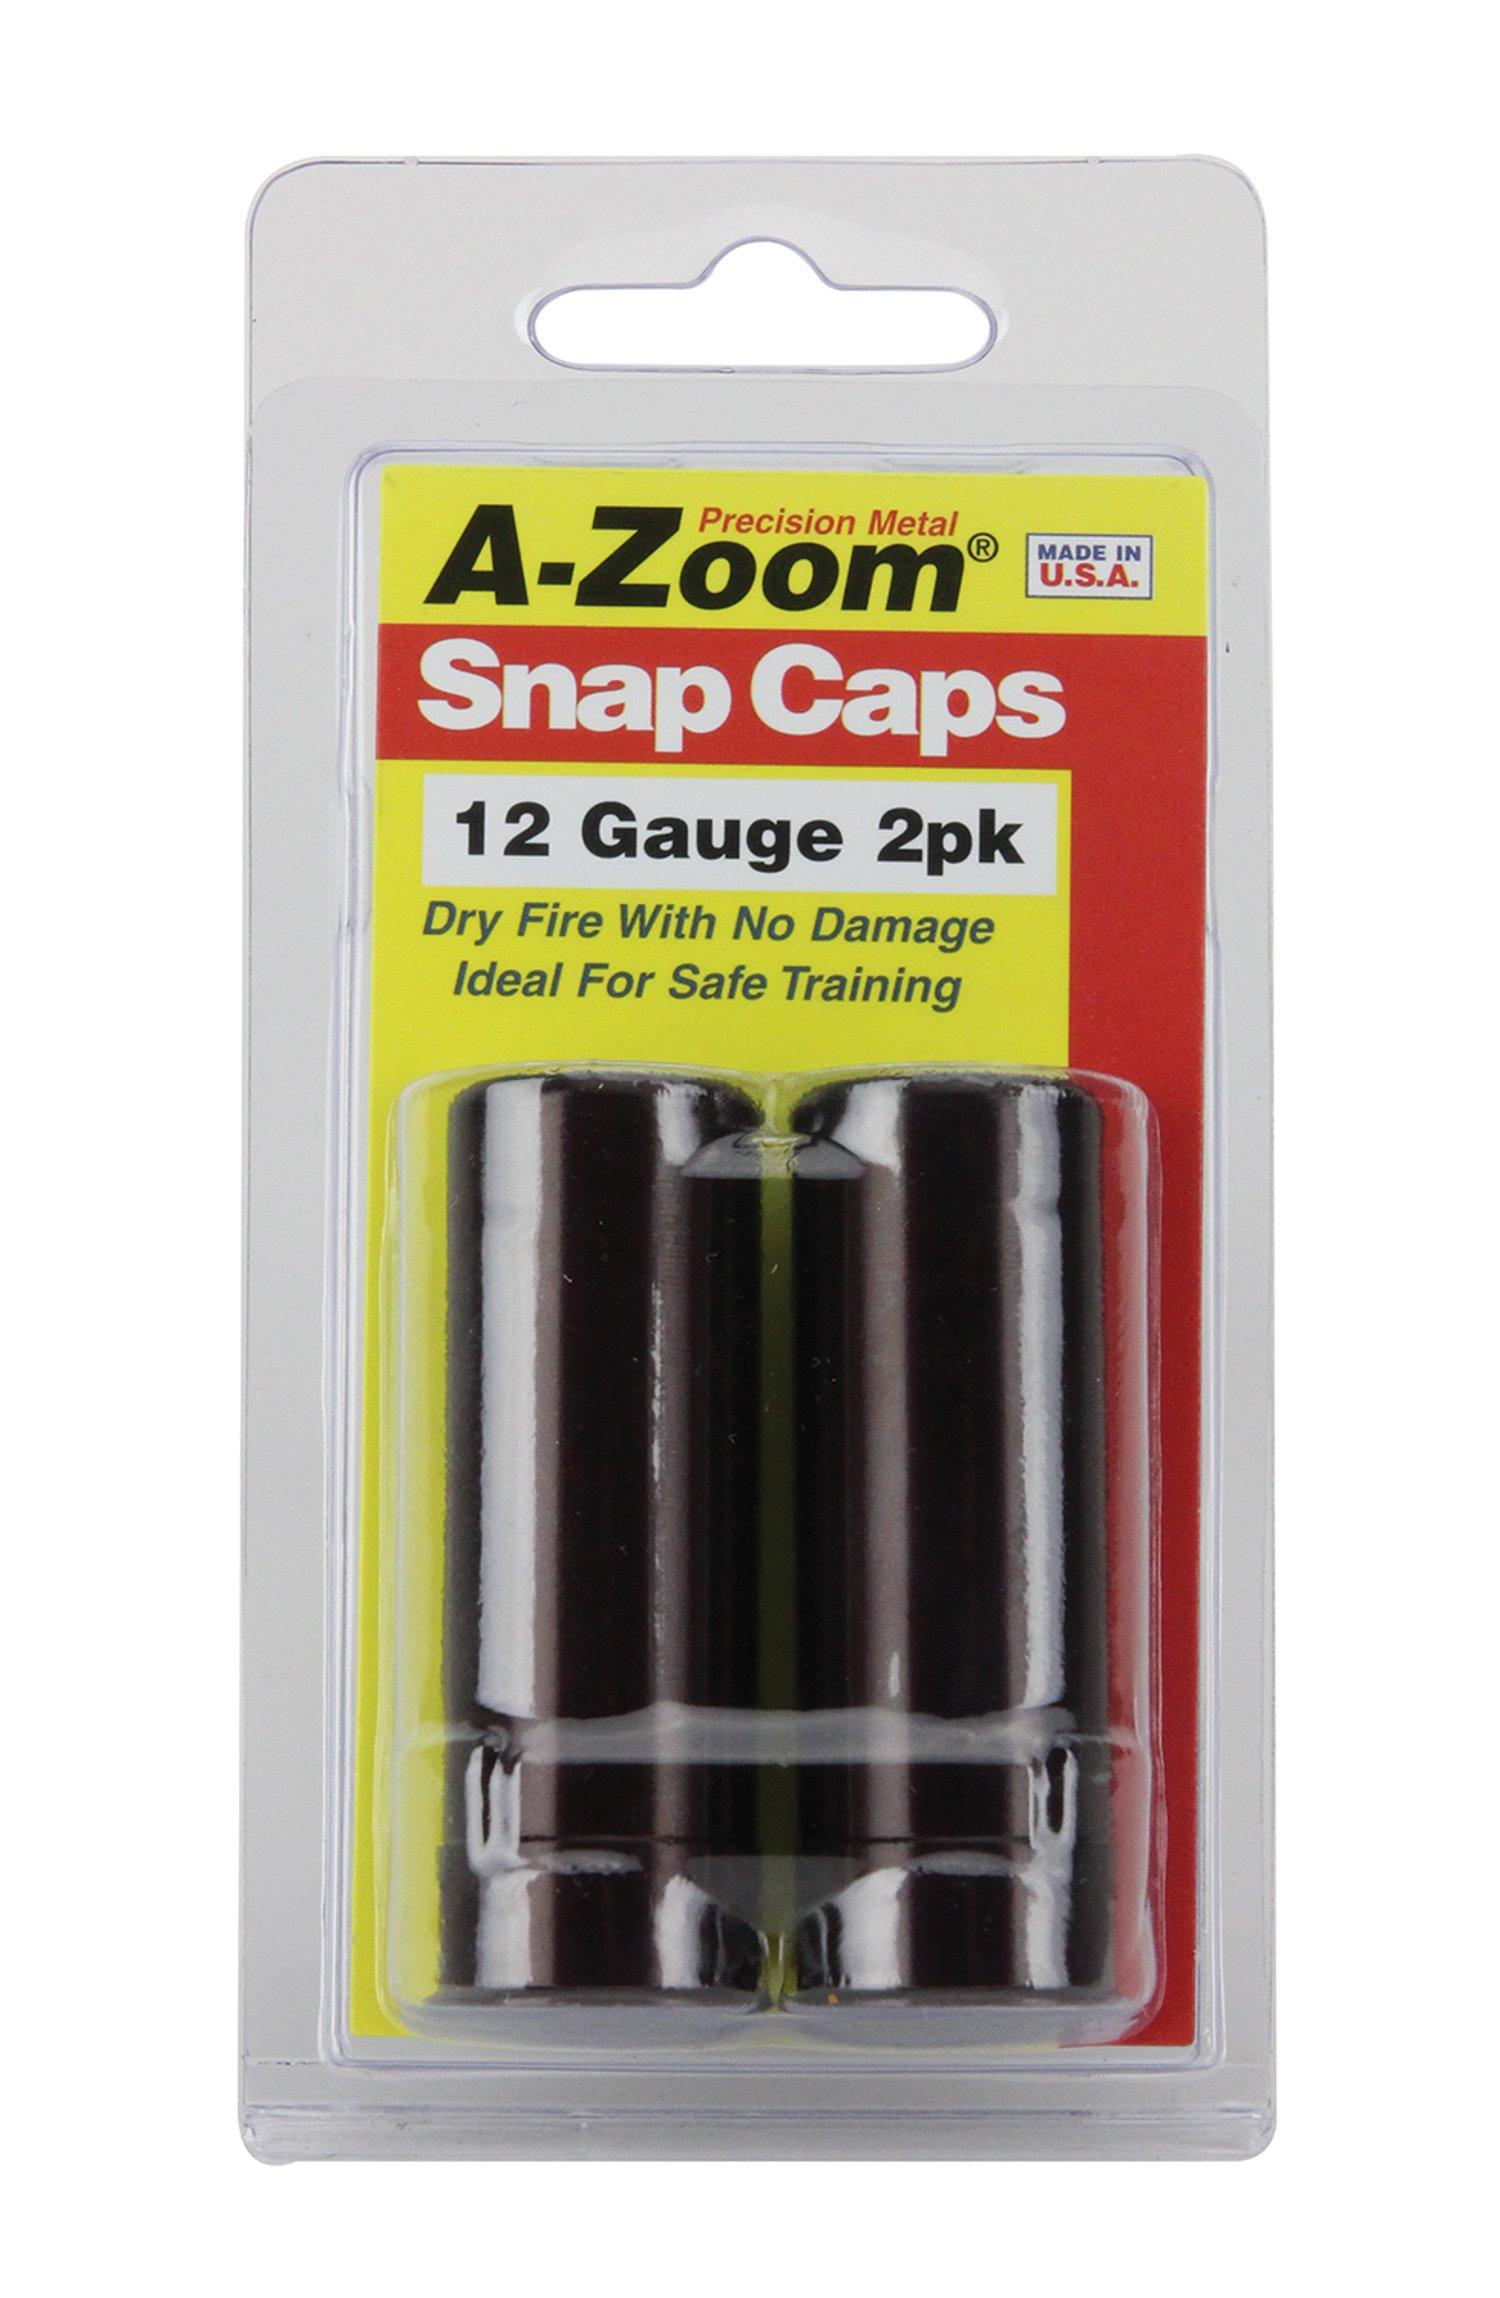 A-Zoom Precision Snap Caps 12 Gauge